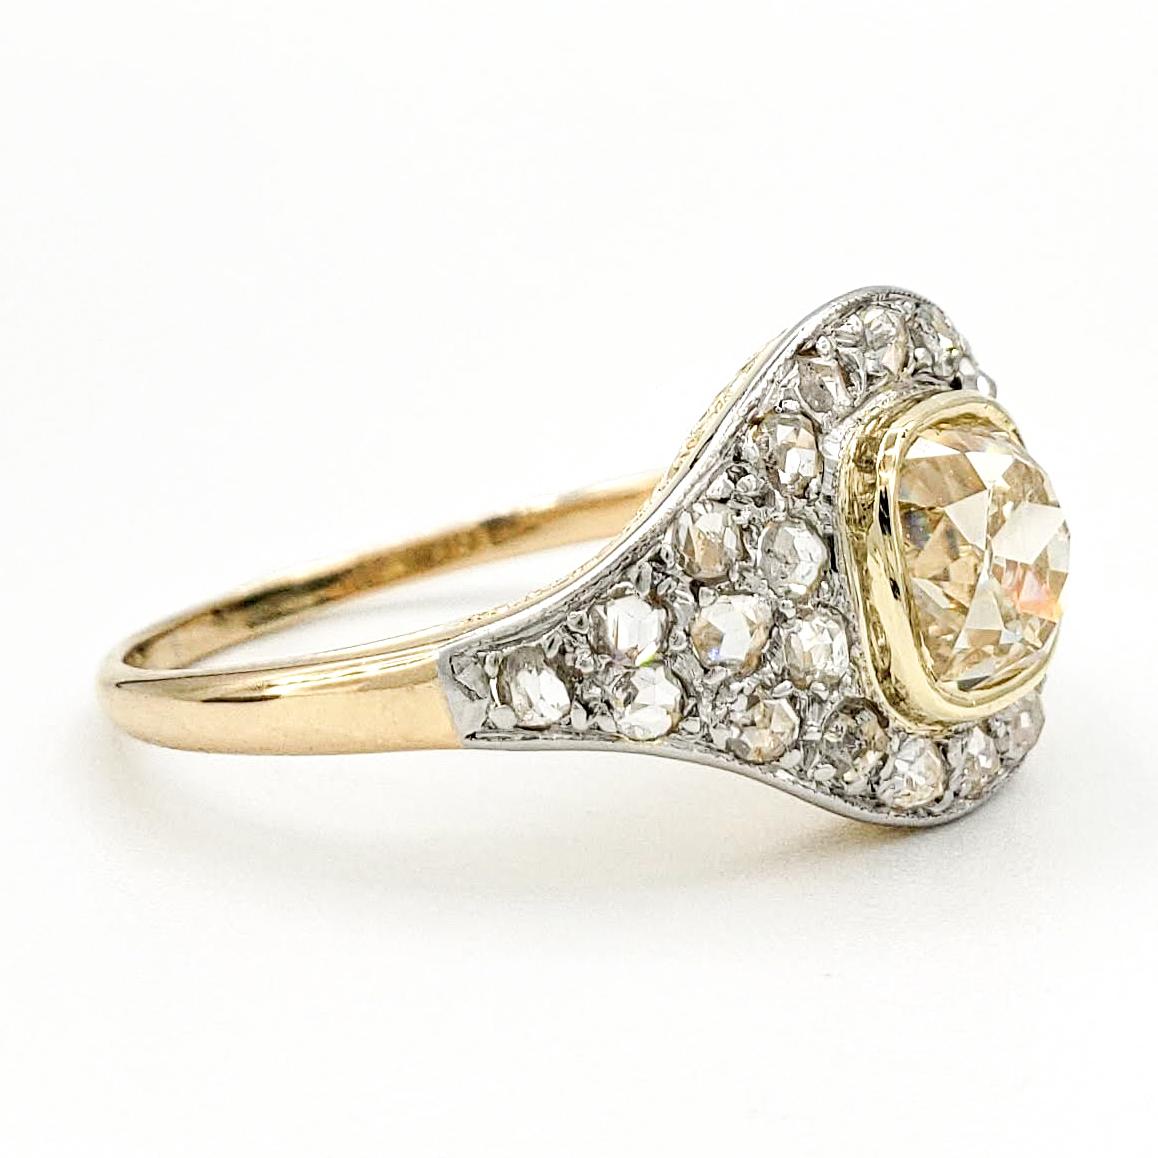 vintage-18-karat-gold-engagement-ring-with-1-41-carat-old-mine-cut-diamond-gia